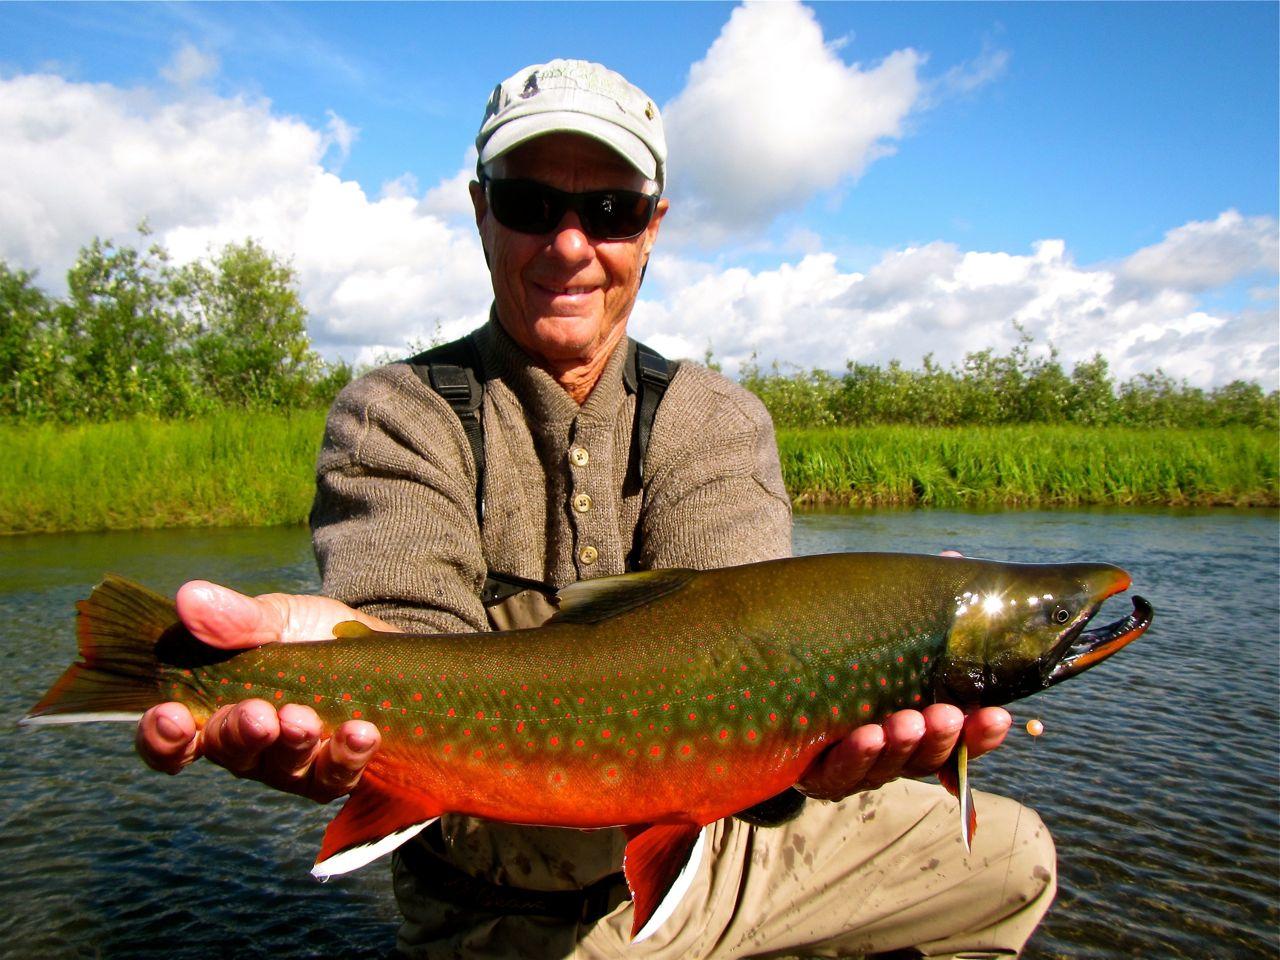 Dolly varden alaska fly fishing lodge for Dolly varden fish